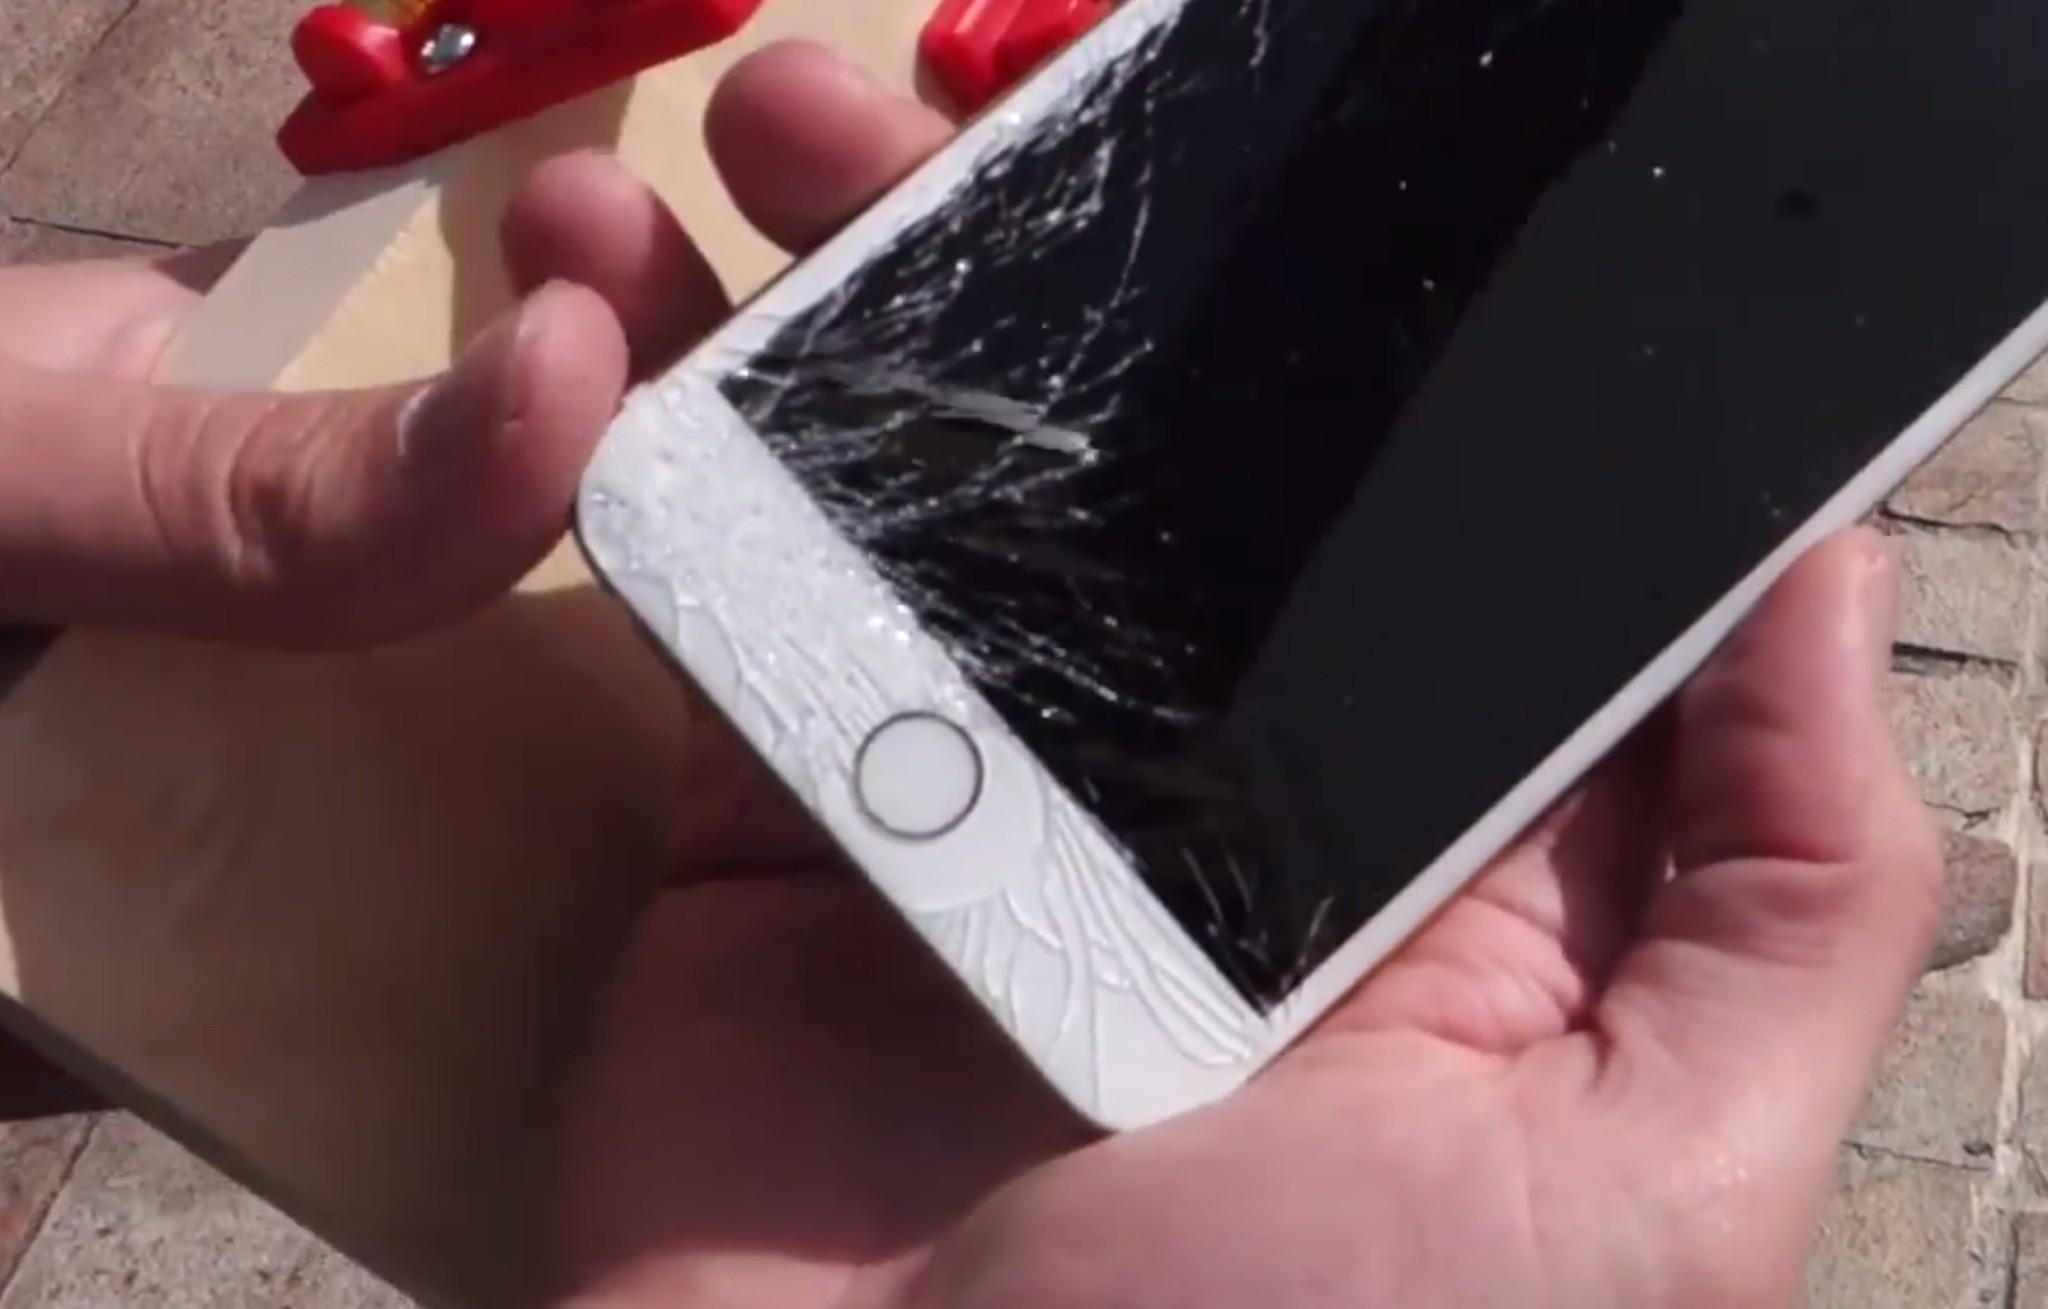 iphone screen repair mckinney, iphone repair mckinney, tx